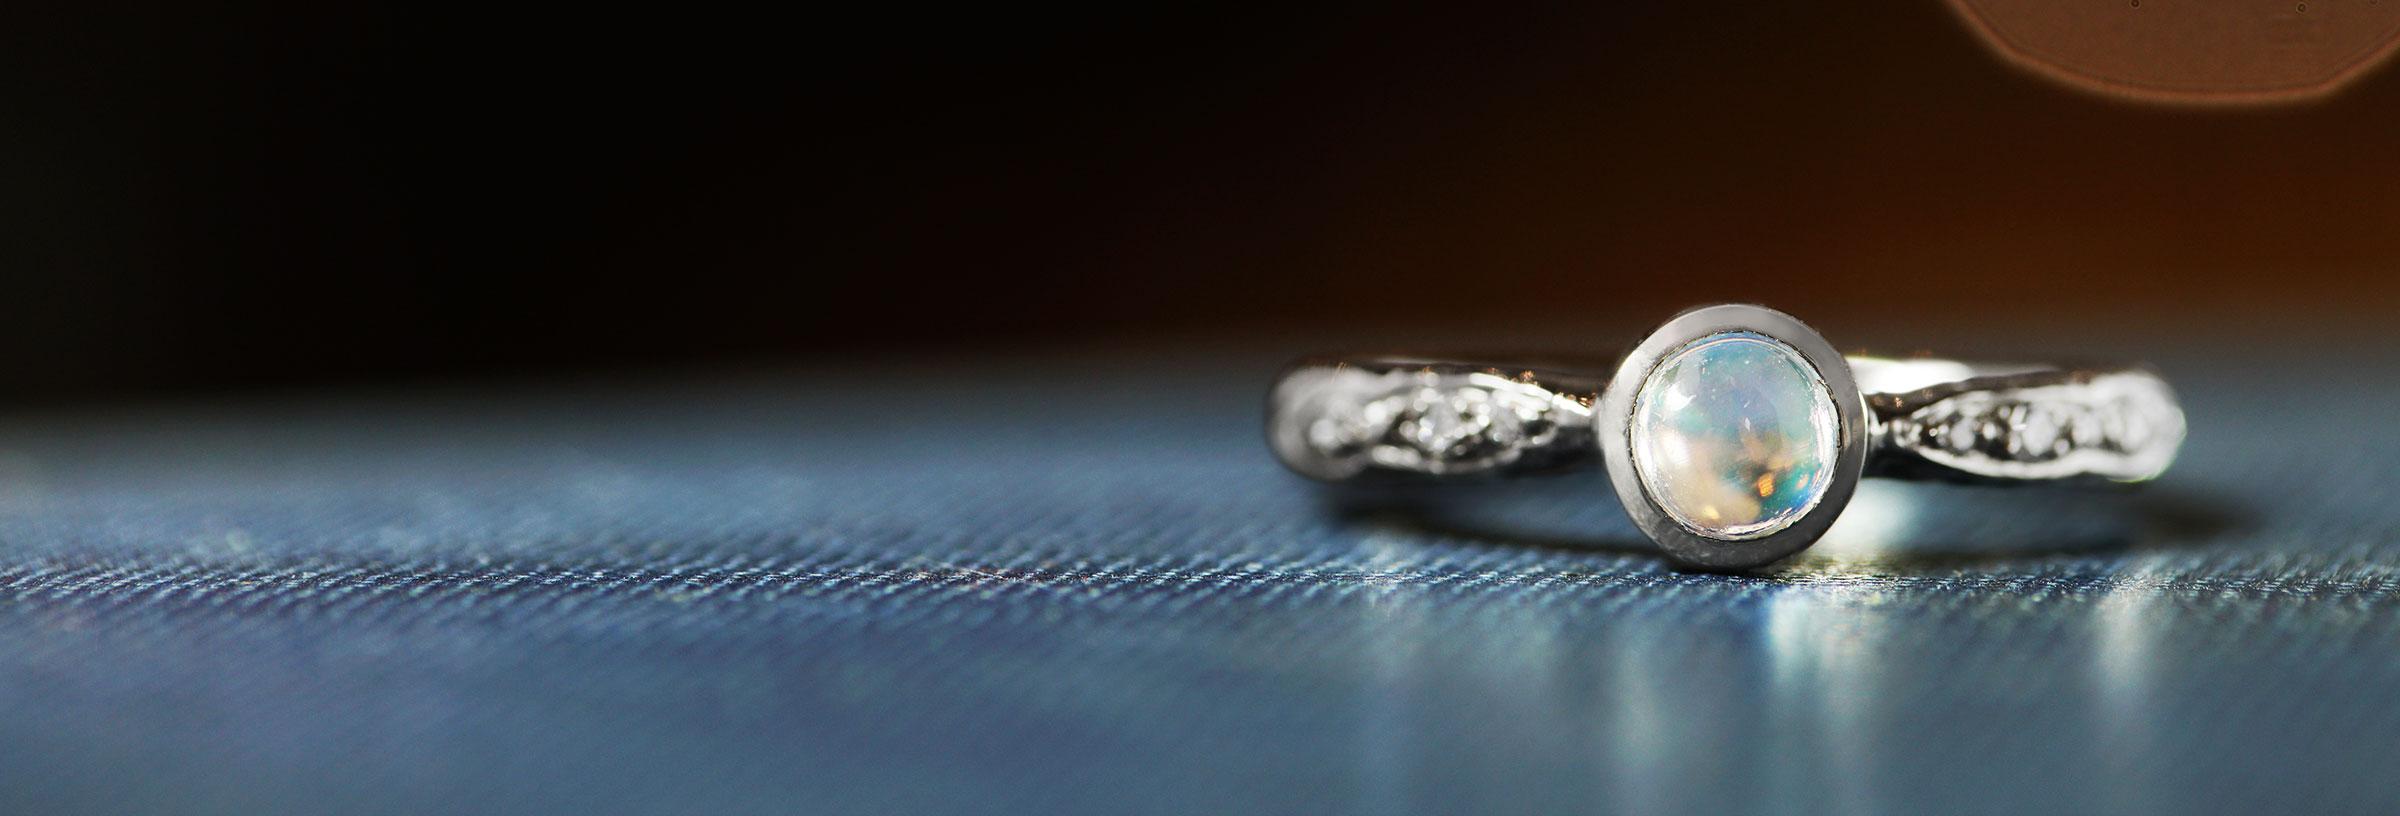 palladium-engagement-ring-with-moonstone-and-diamonds